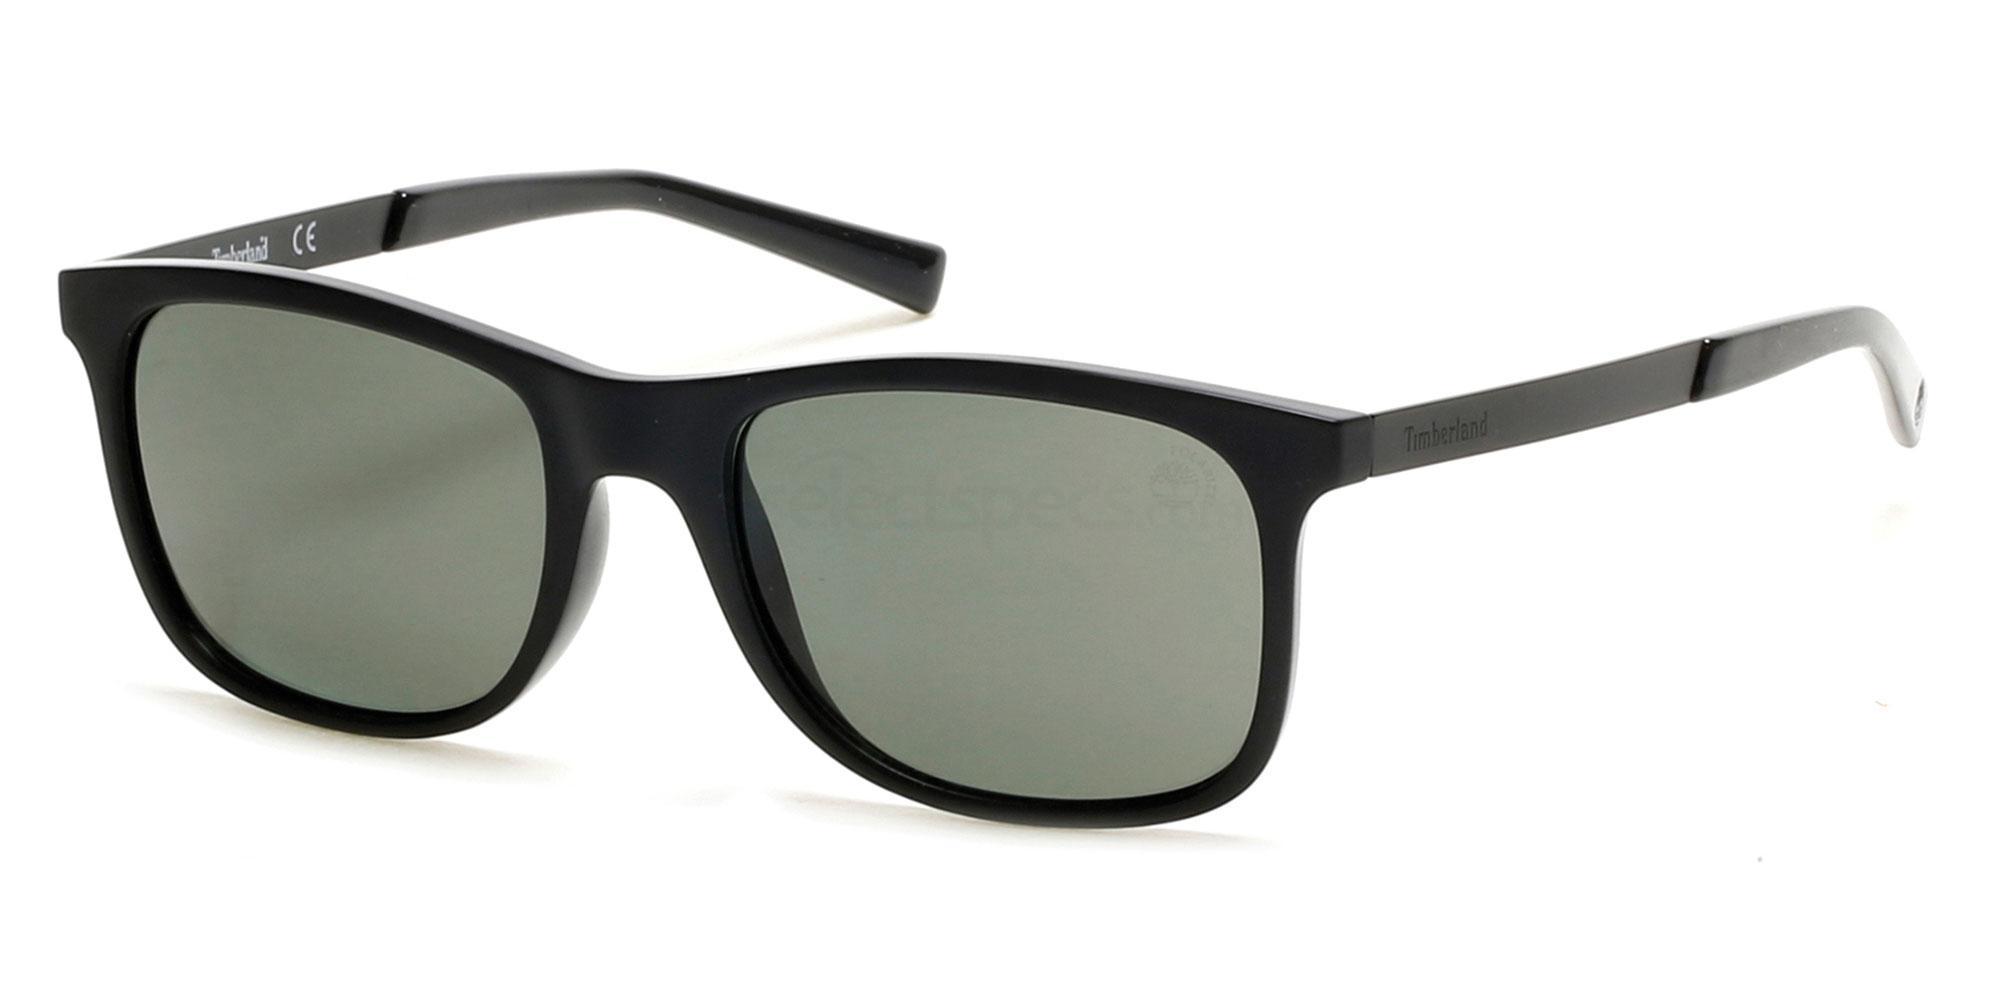 05R TB9110 Sunglasses, Timberland